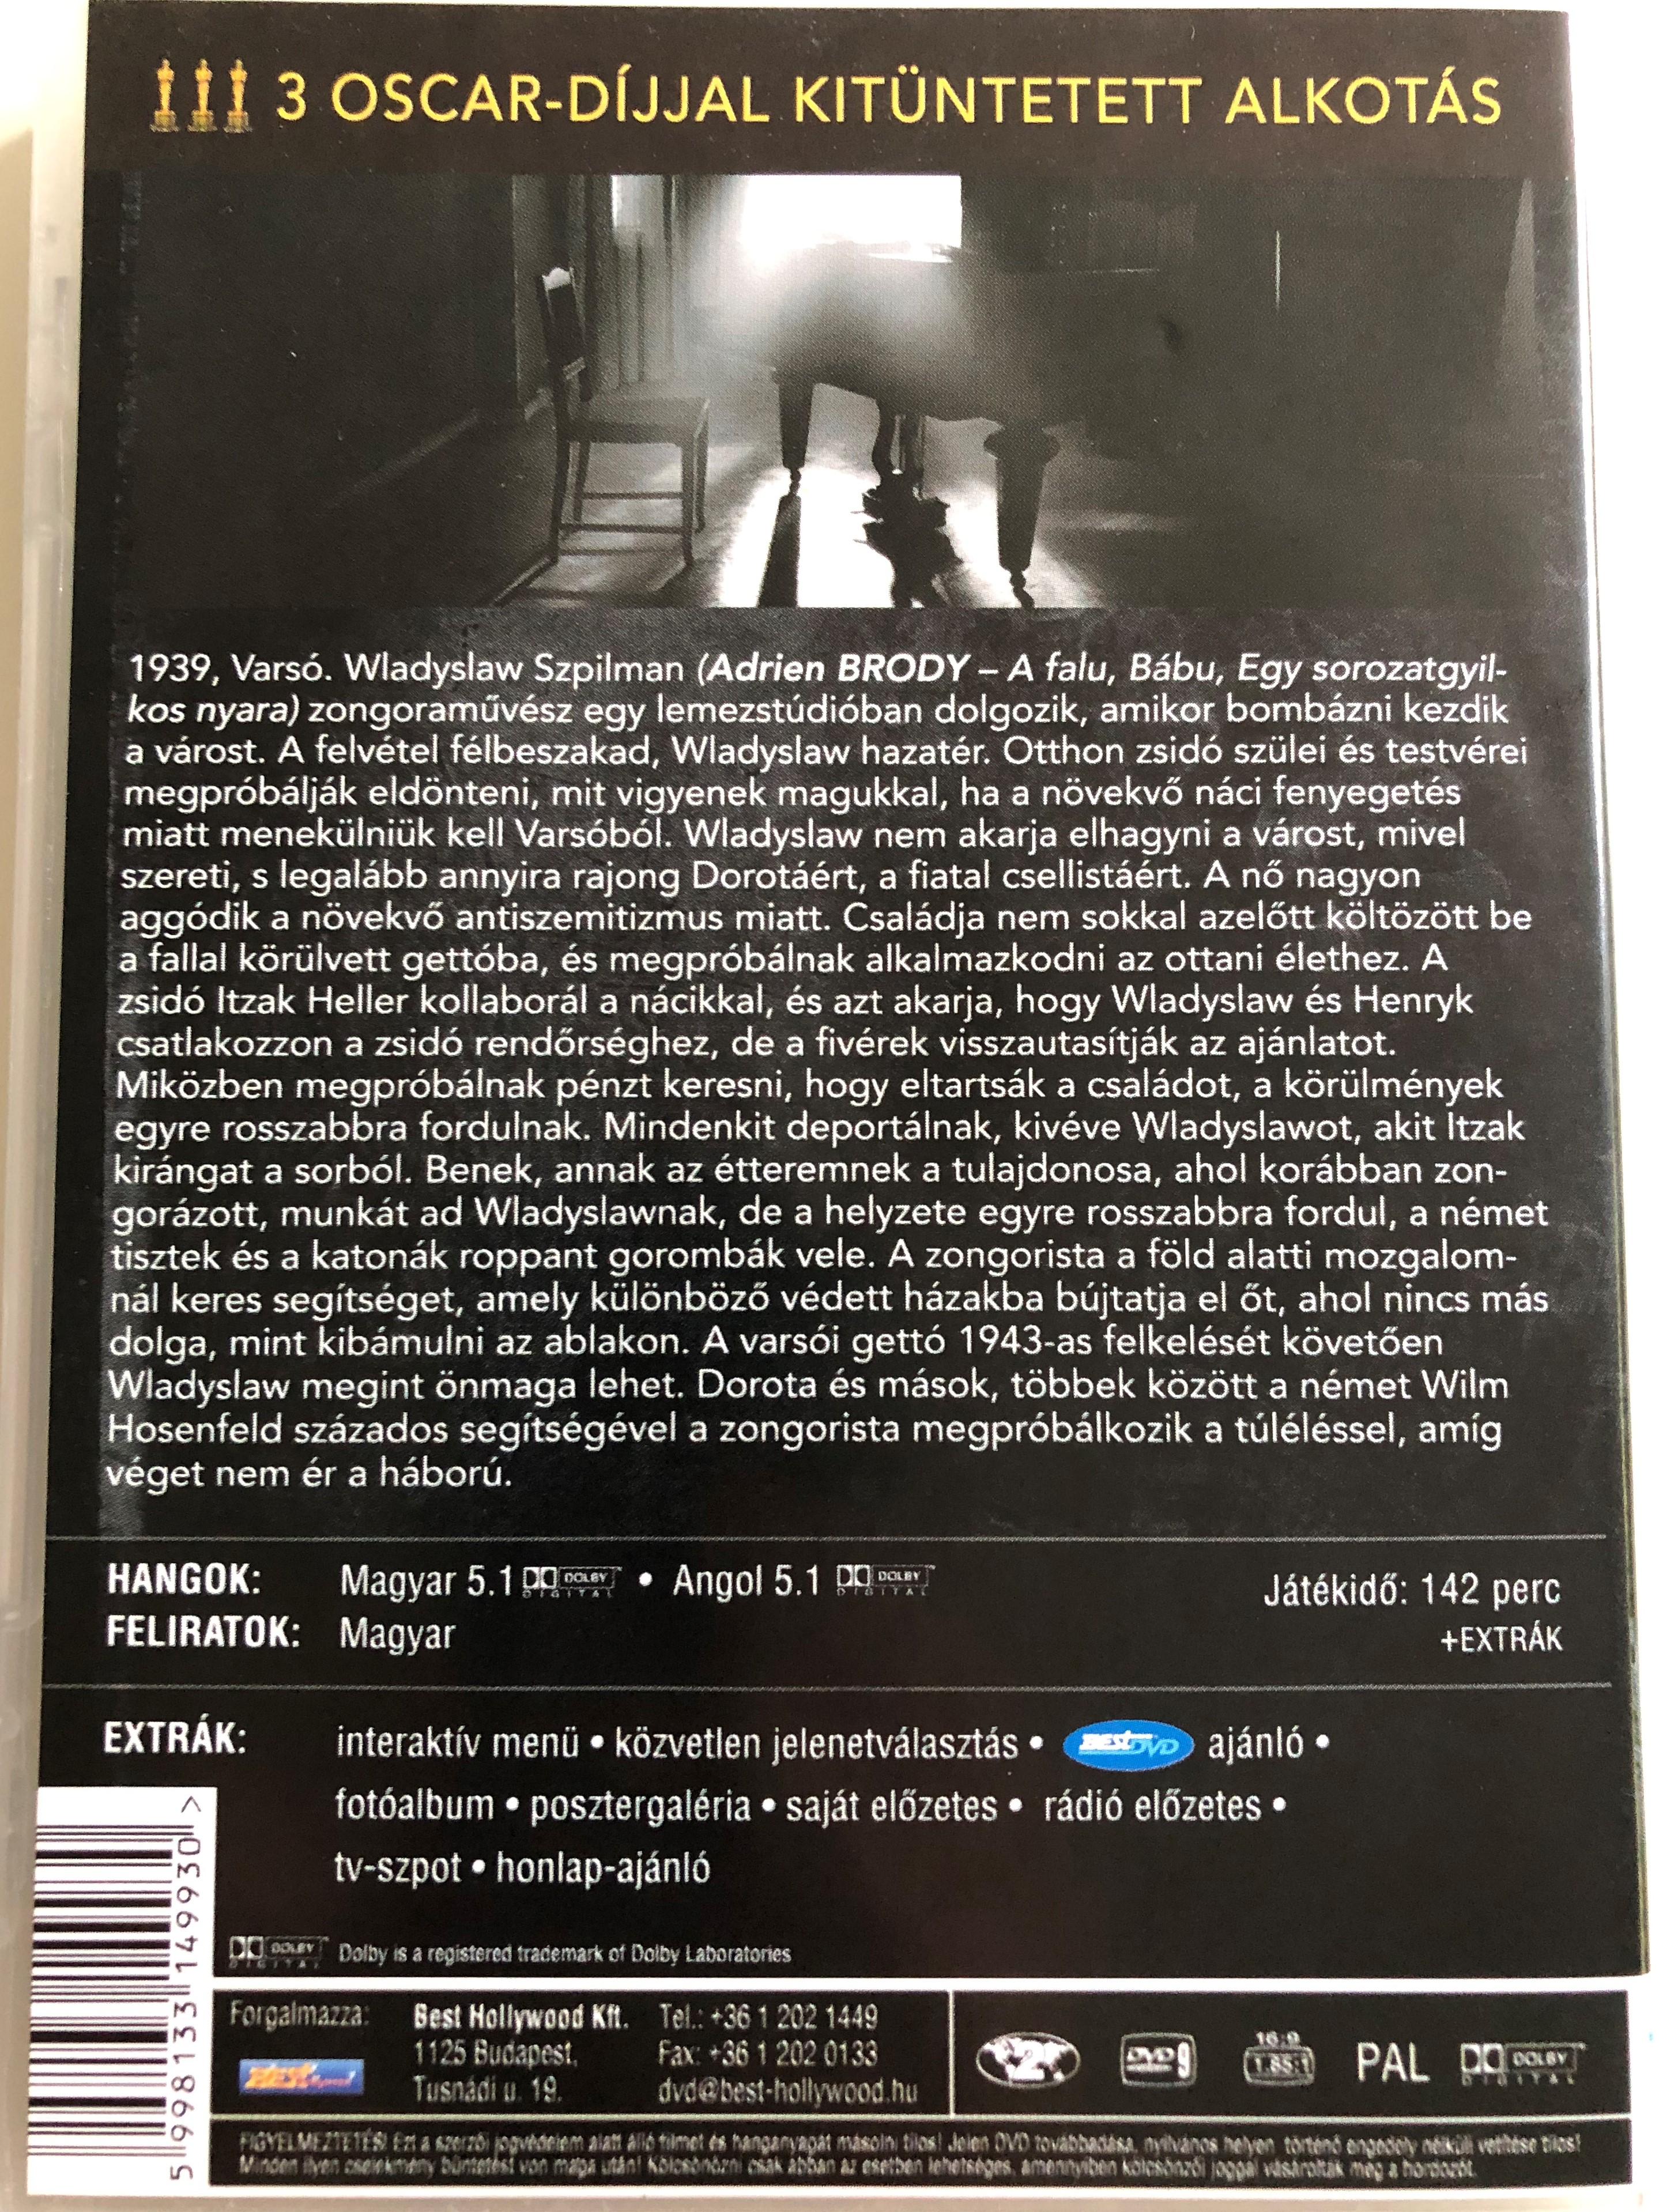 the-pianist-2002-a-zongorista-directed-by-roman-polanski-starring-adrien-brody-thomas-kretschmann-frank-finlay-maureen-lipman-emilia-fox-micha-ebrowski-based-on-the-pianist-by-w-adys-aw-szpilman-2-.jpg